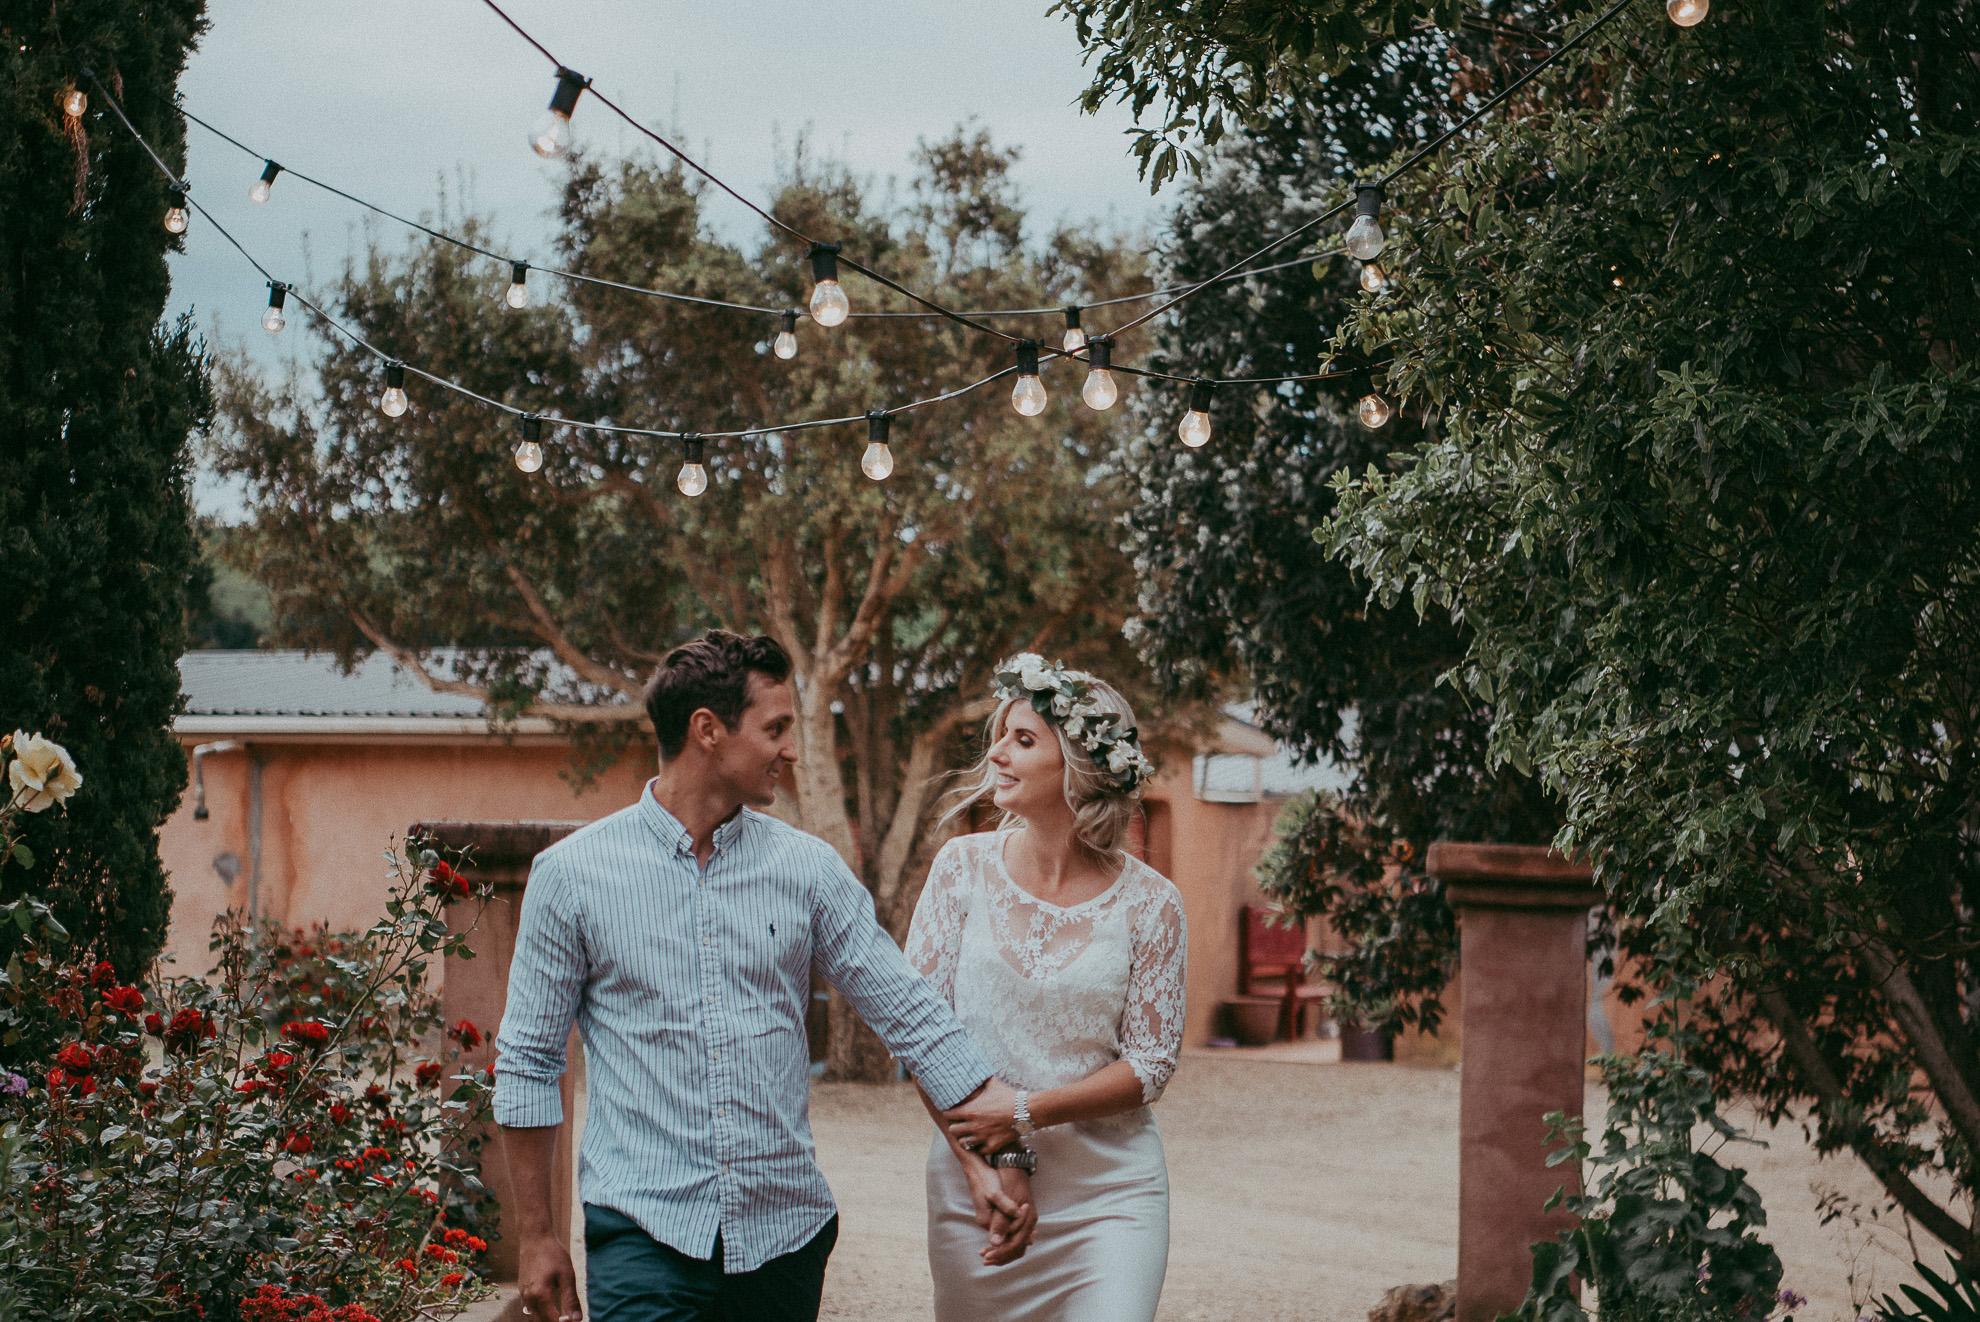 wedding-by-olgalevien-349.JPG